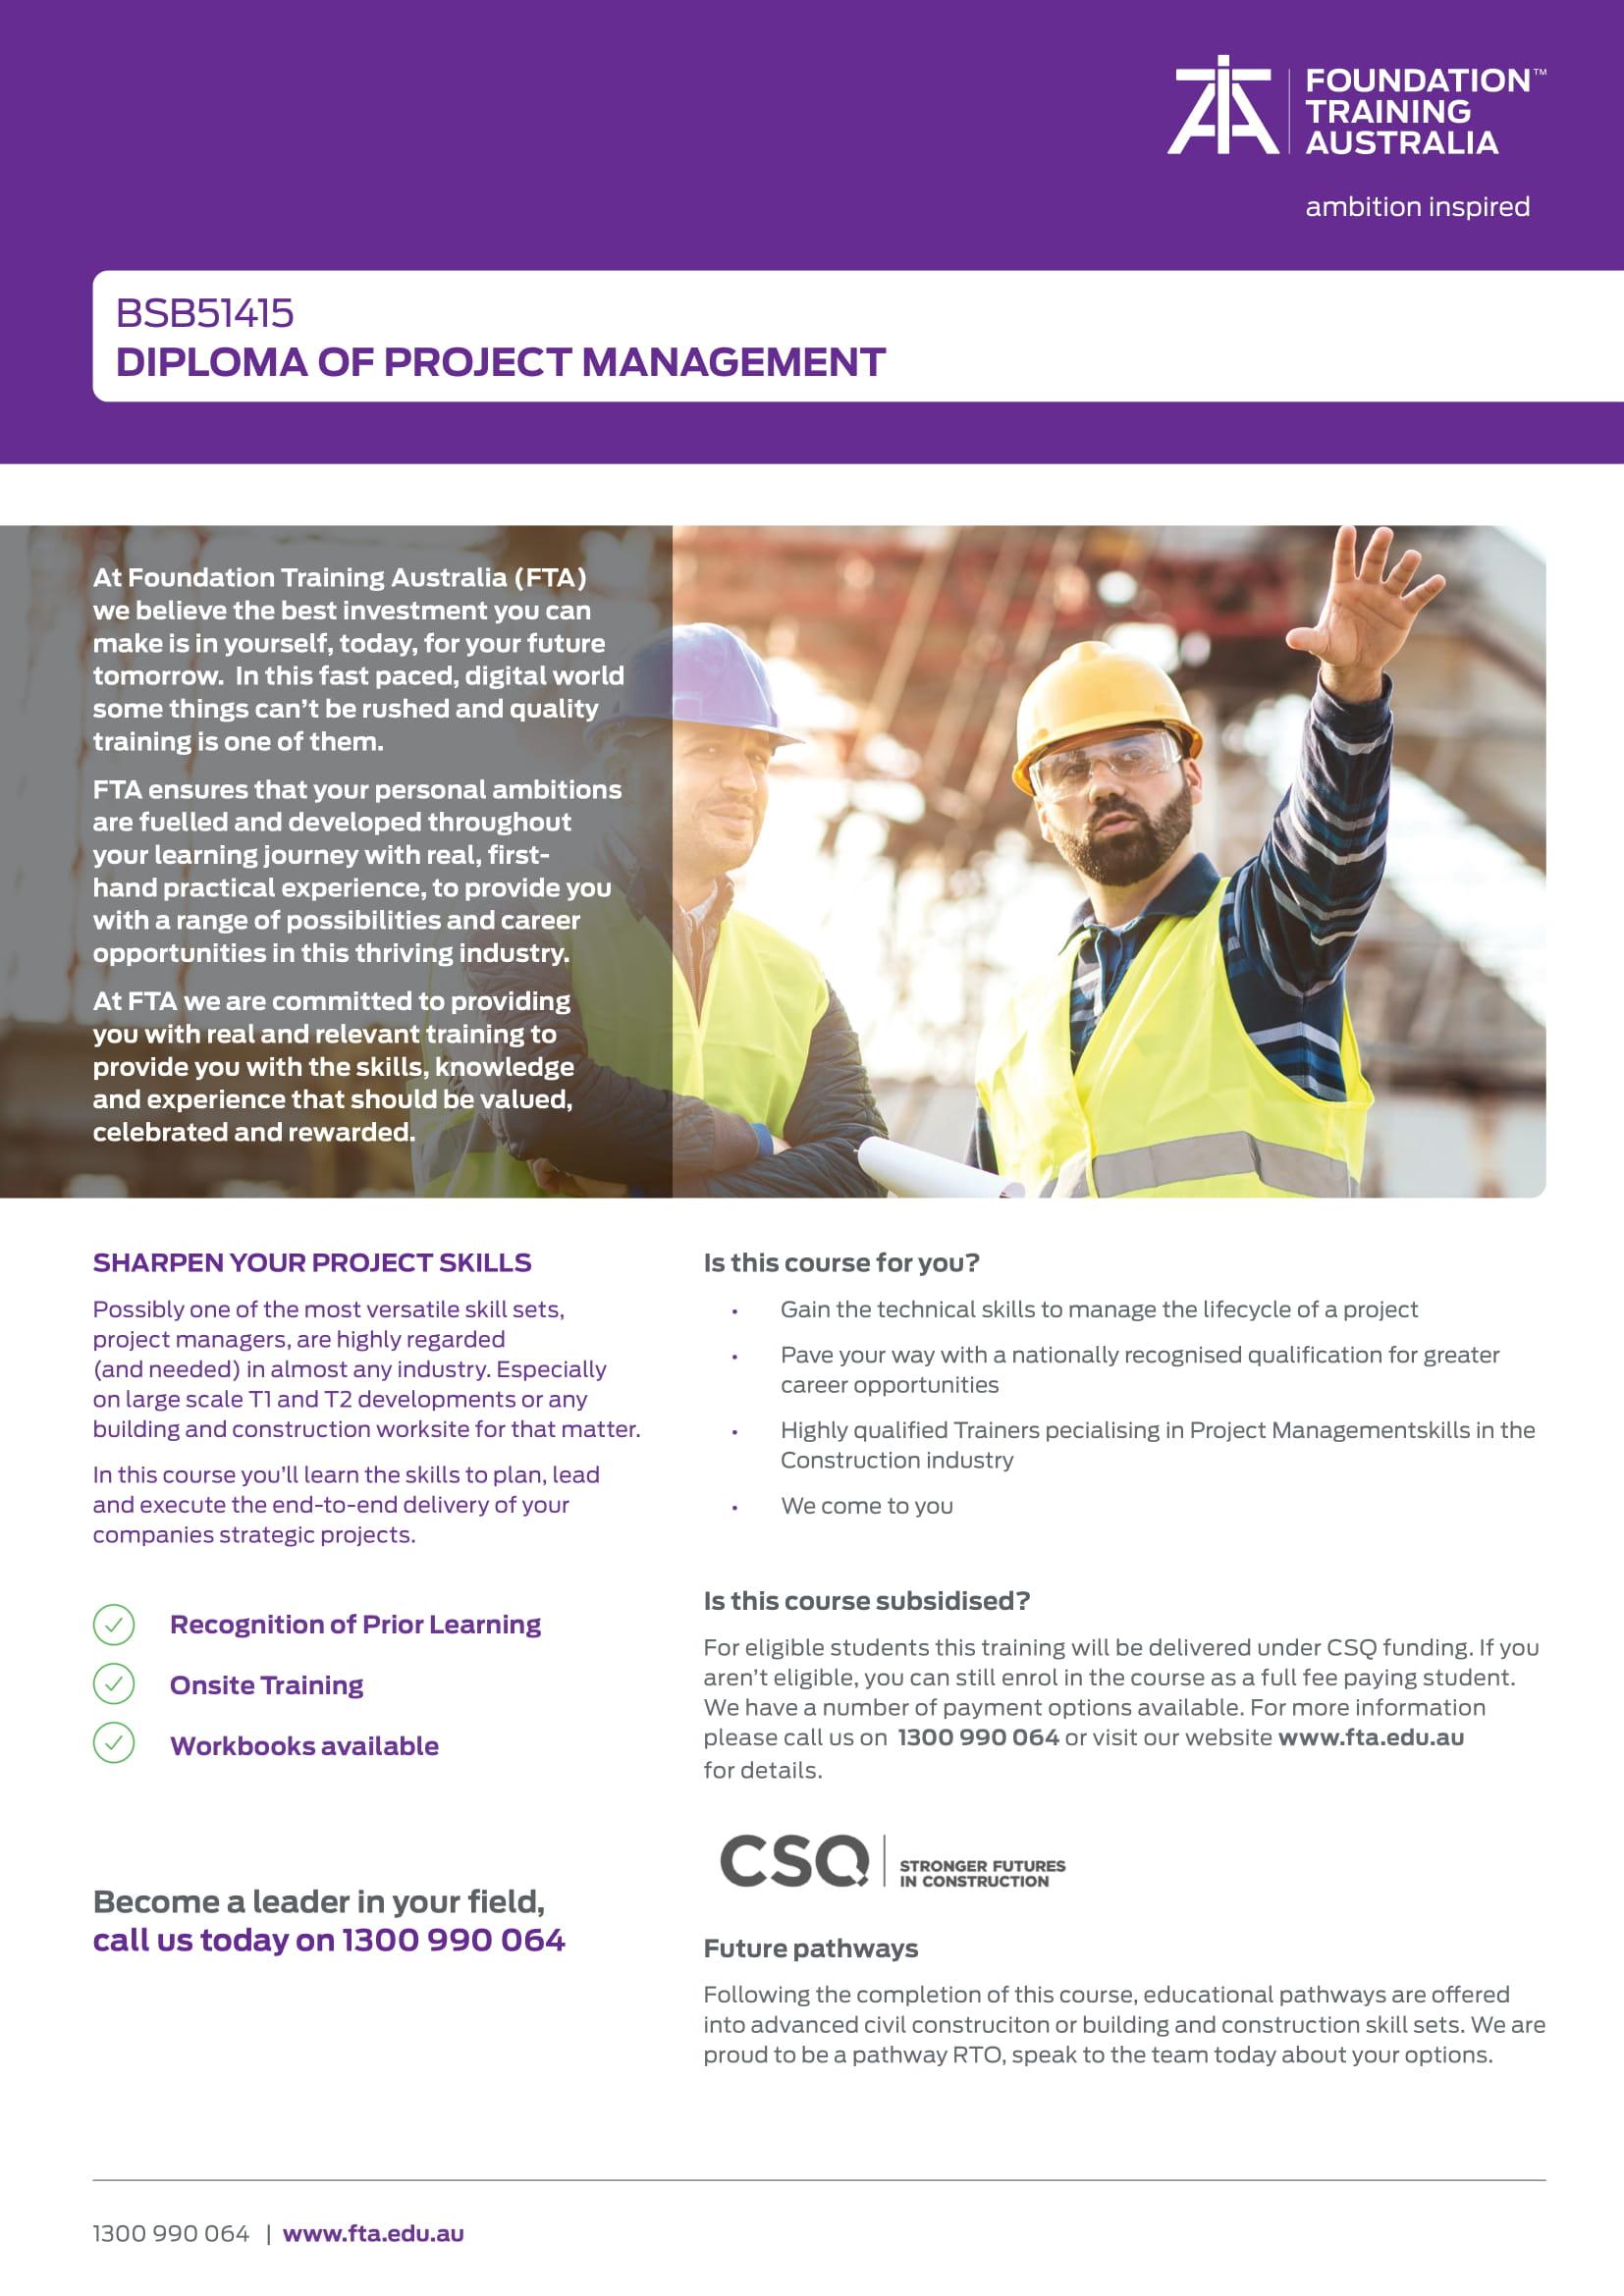 https://www.fta.edu.au/wp-content/uploads/2020/06/TP1.MK_.015-Diploma-of-Project-Management-BSB51415-1.jpg